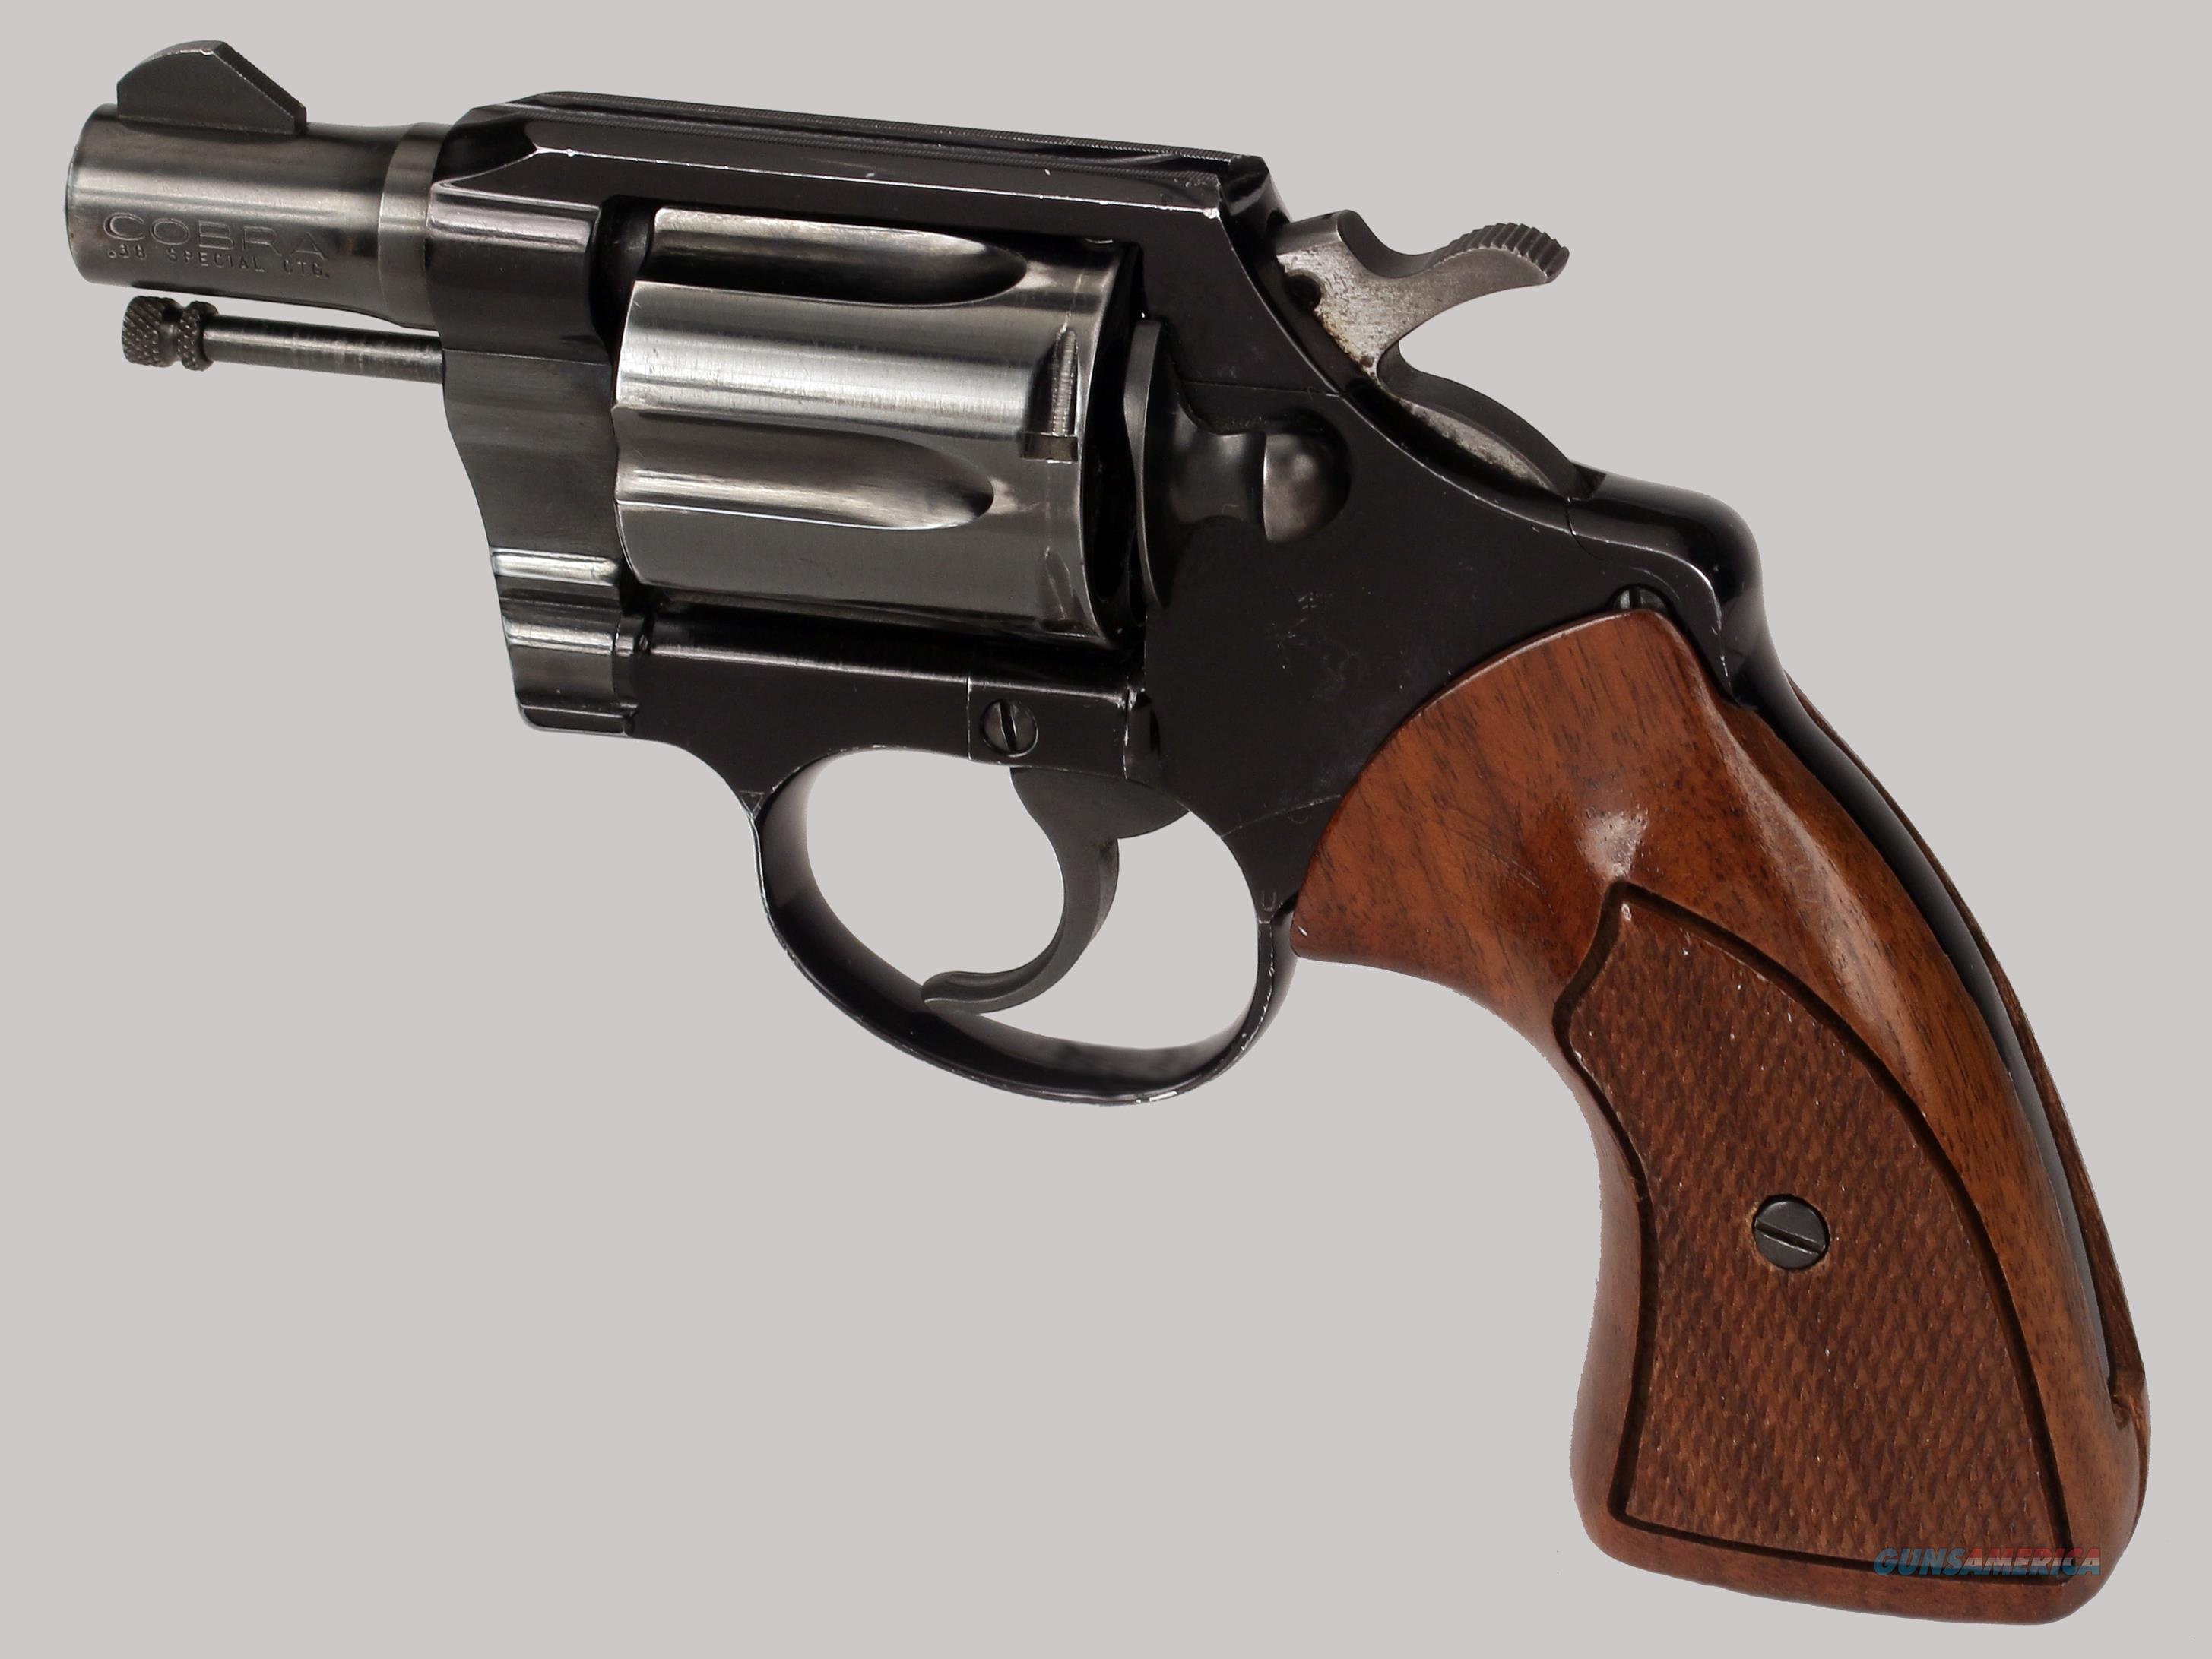 HQ Colt Cobra 38 Special Revolver Wallpapers | File 318.7Kb